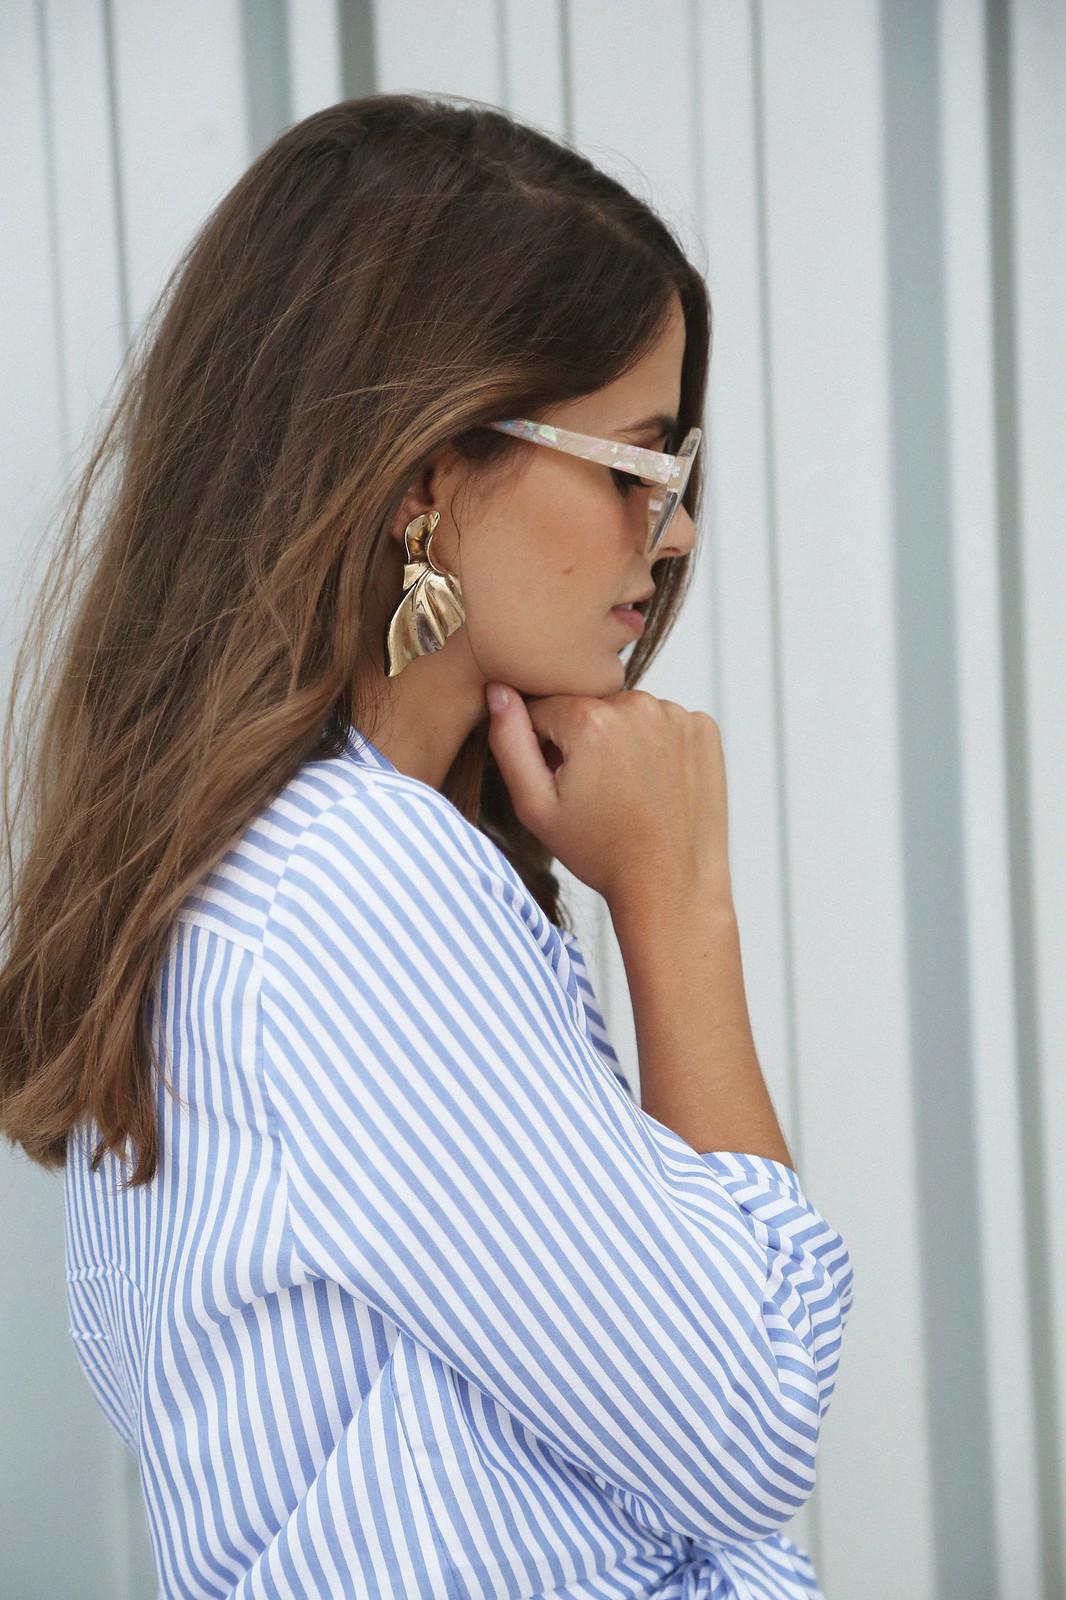 jessie chanes seams for a desire denim skirt stripes shirt-12